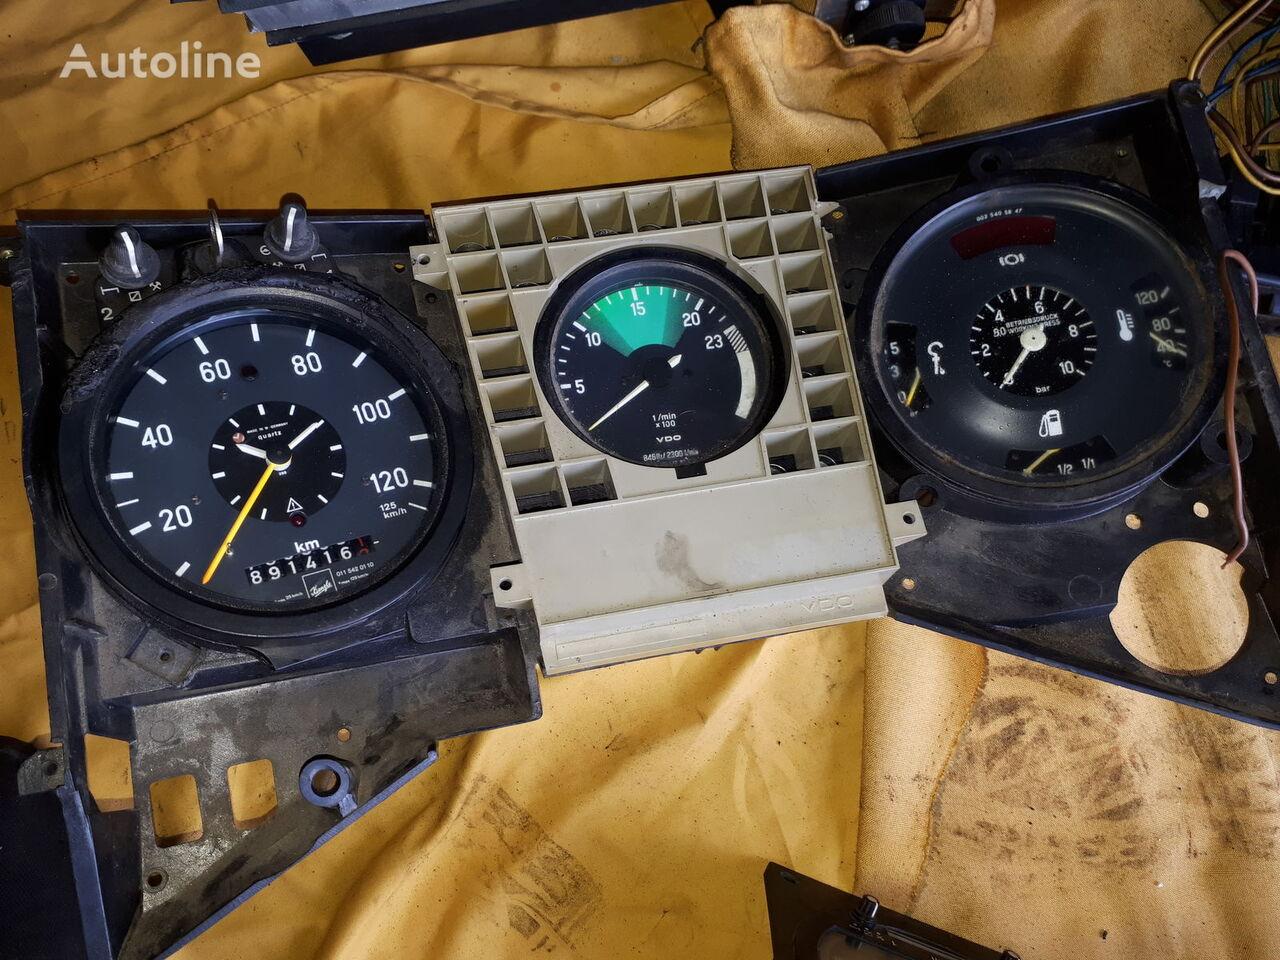 panou cu dispozitive SCANIA 1780556(1856816) Mersedes O405. Daf. Neoplan. Man. Volvo pentru autobuz SCANIA Omni Link